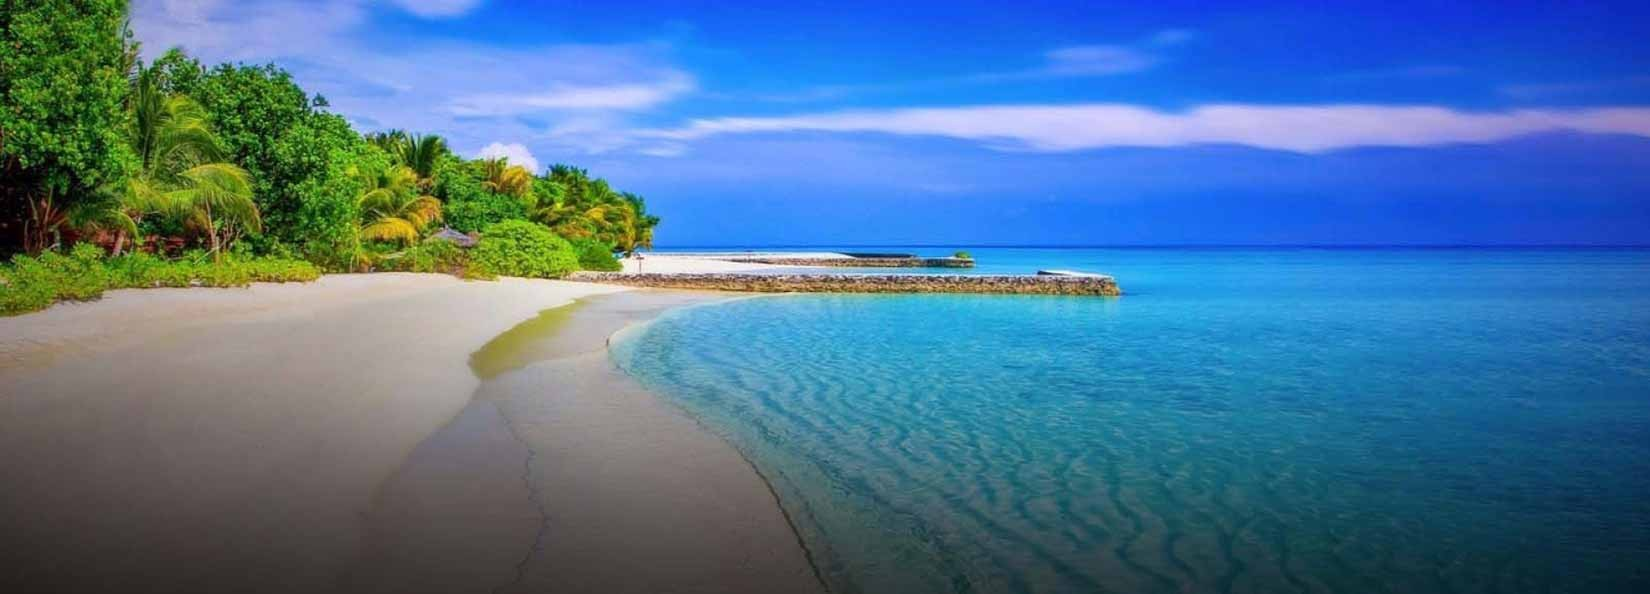 shopinholidays-summer-holidays-package